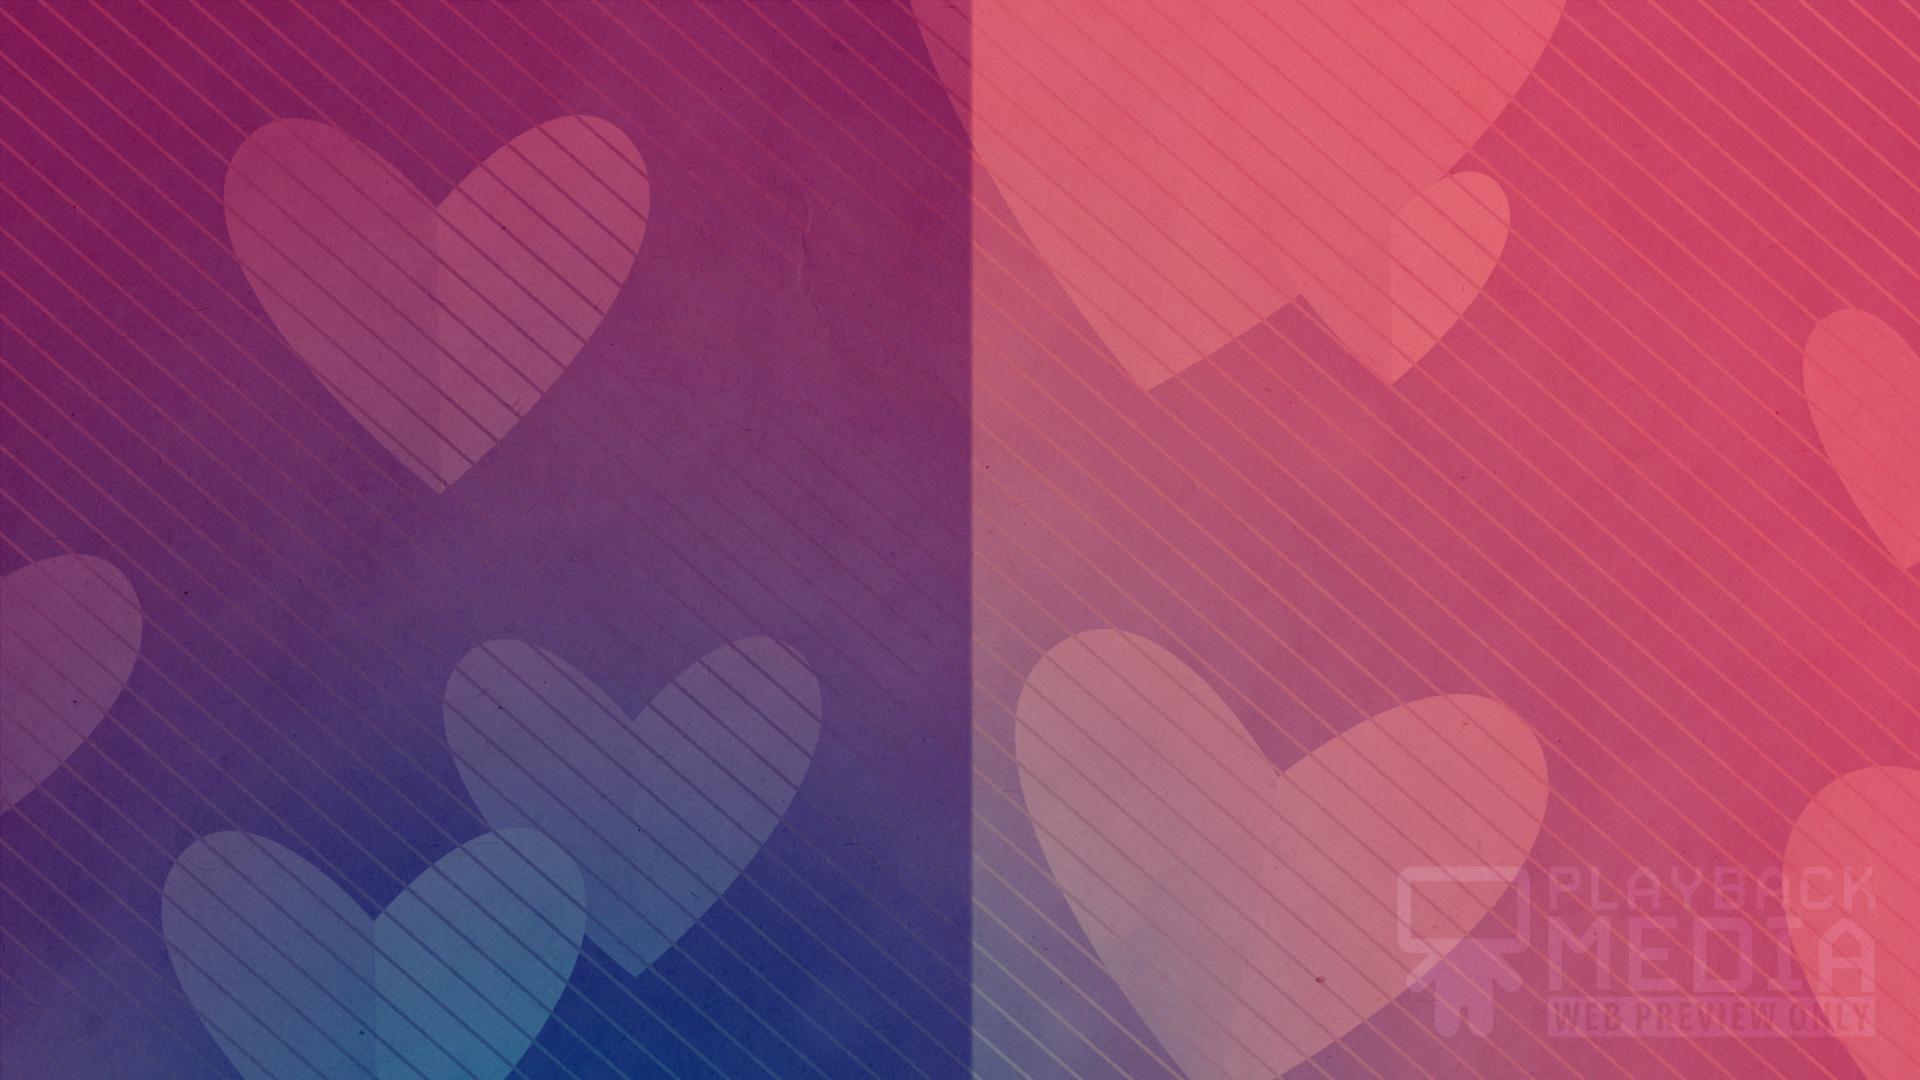 Heartfelt Love Motion Backgorund